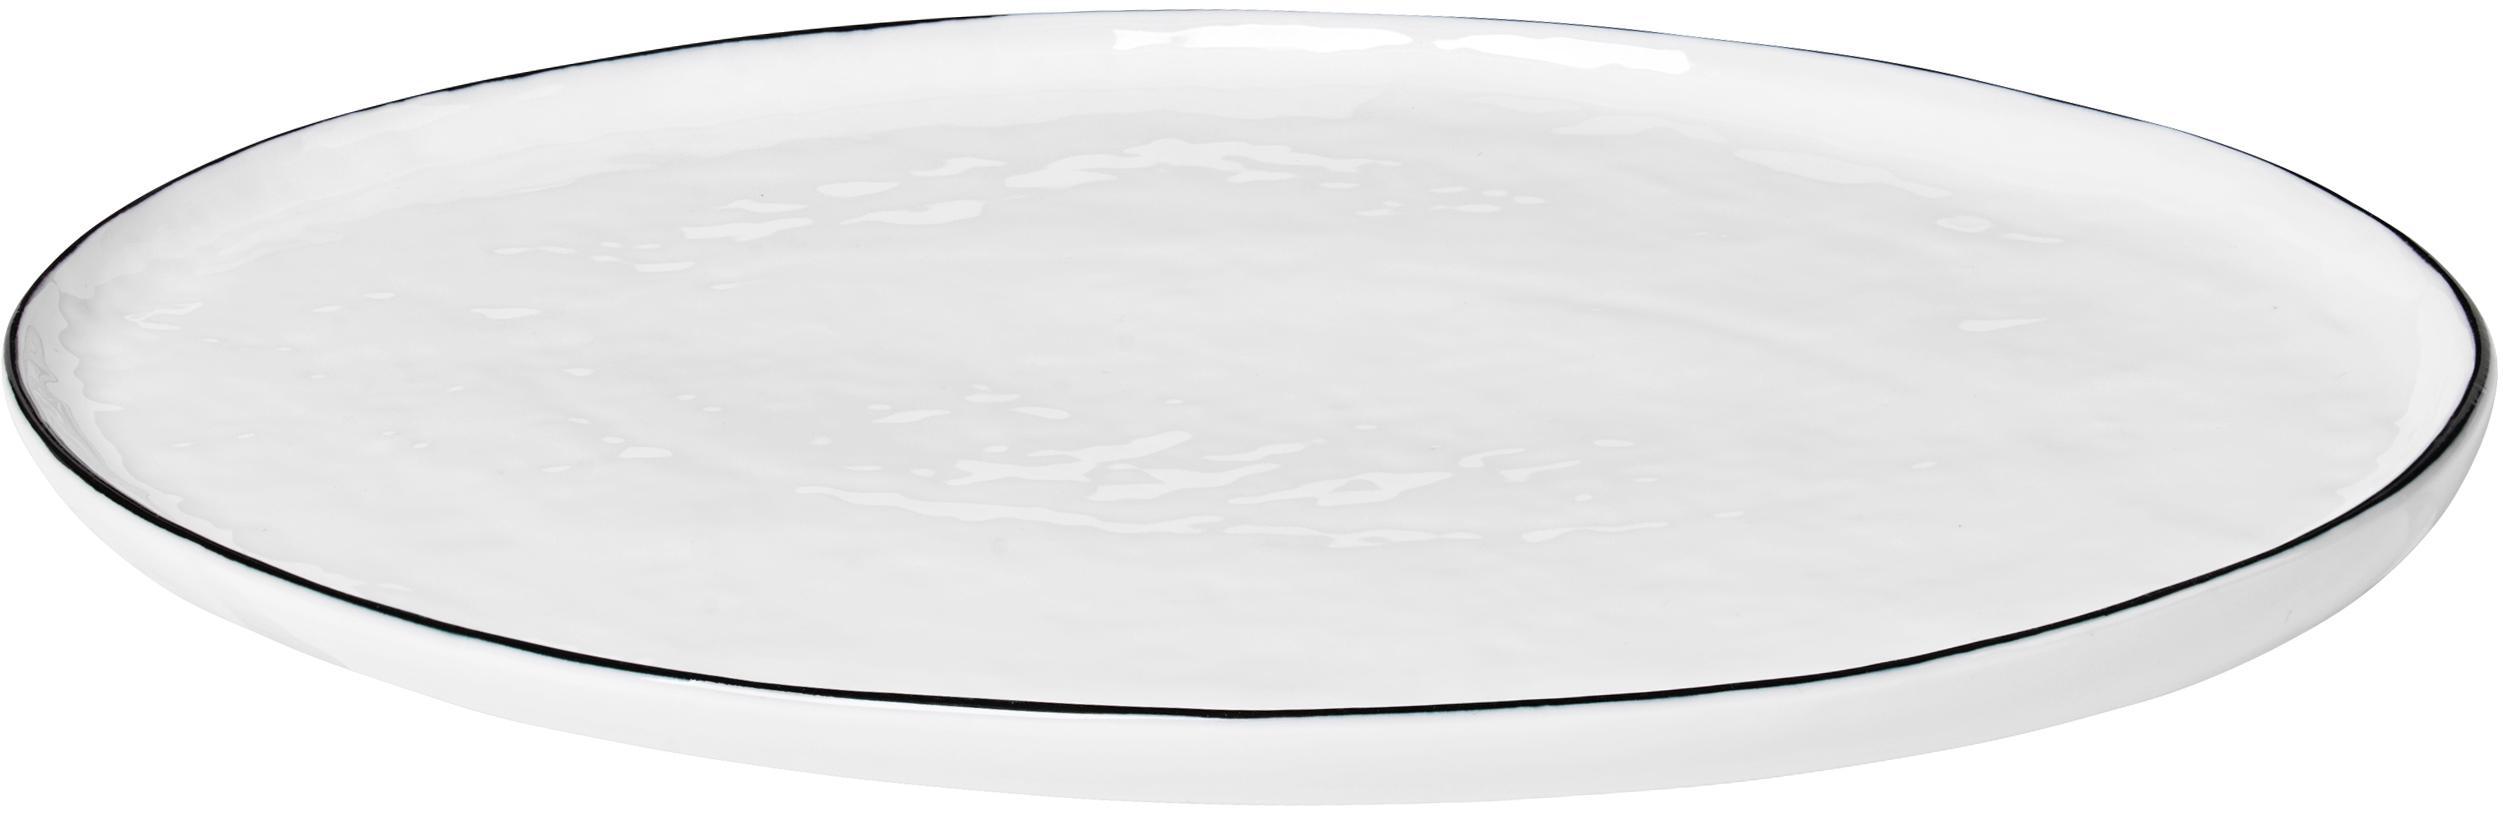 Fuente artesanal Salt, Porcelana, Blanco crudo, negro, An 20 x L 30 cm